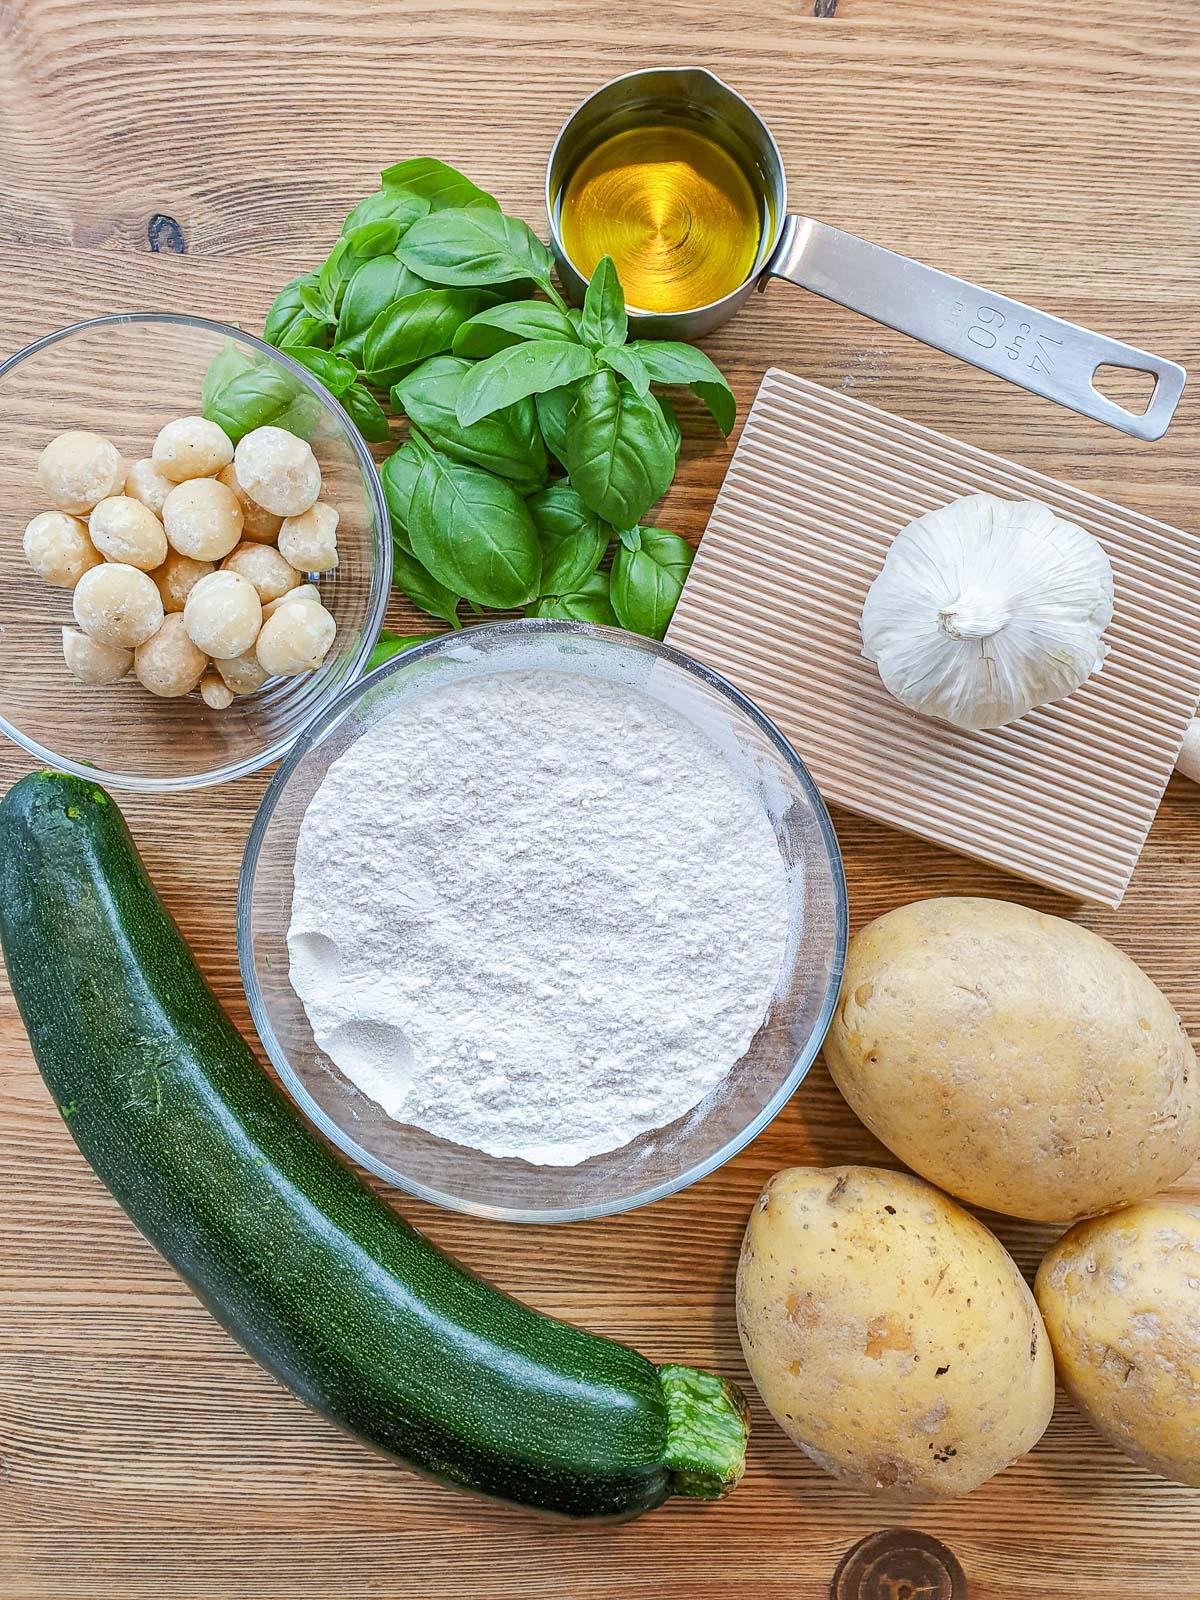 ingredients for gnocchi